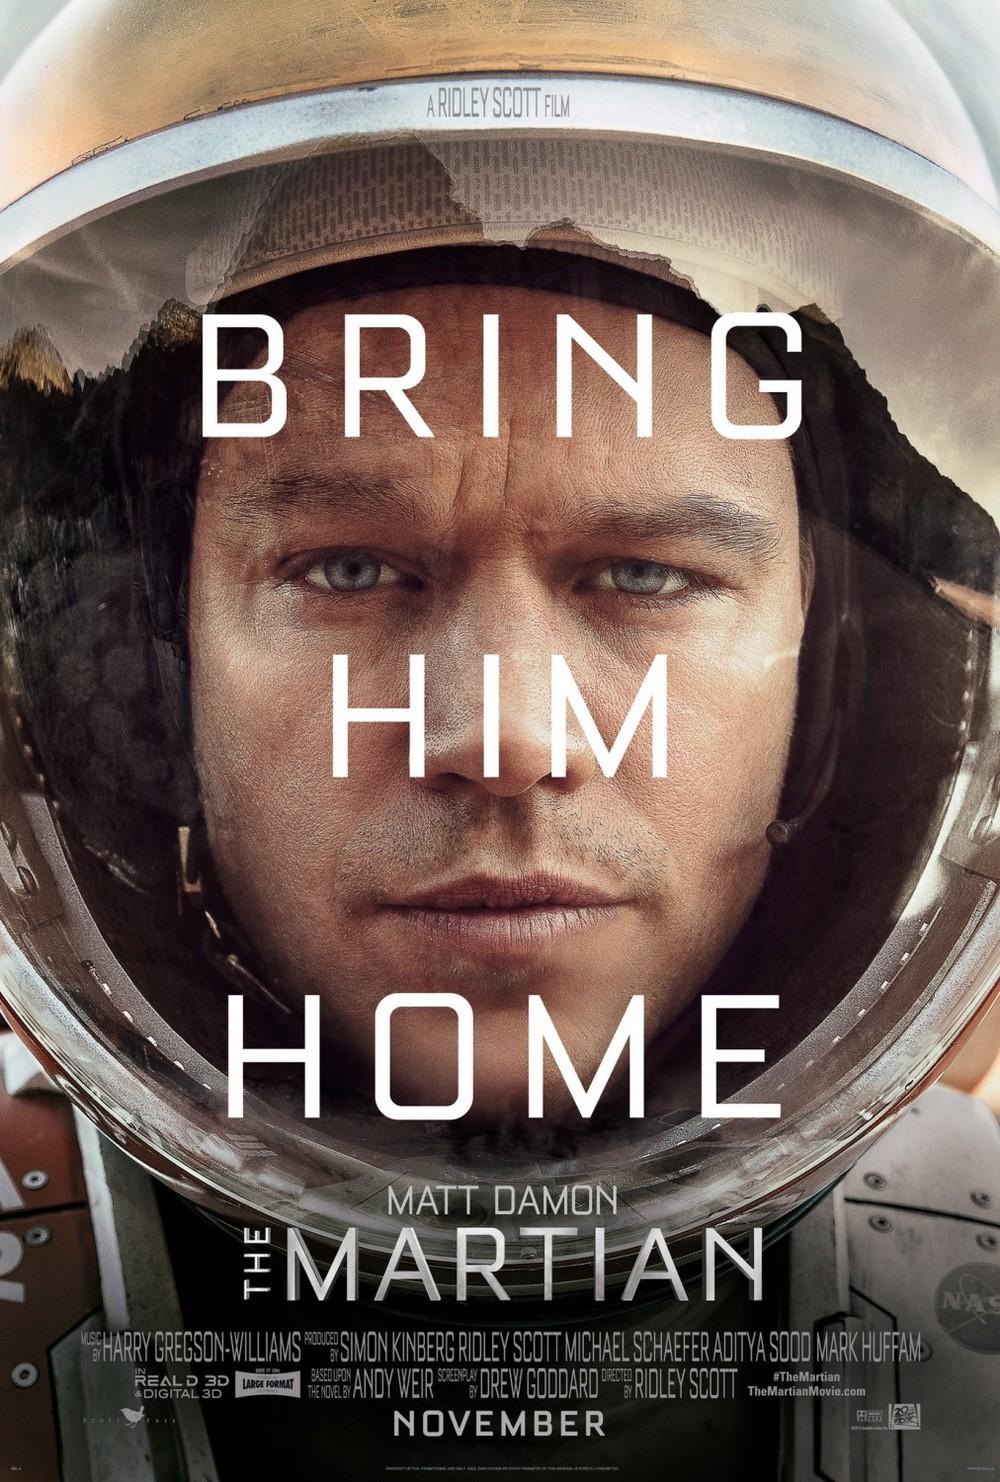 The-Martian-poster.jpg